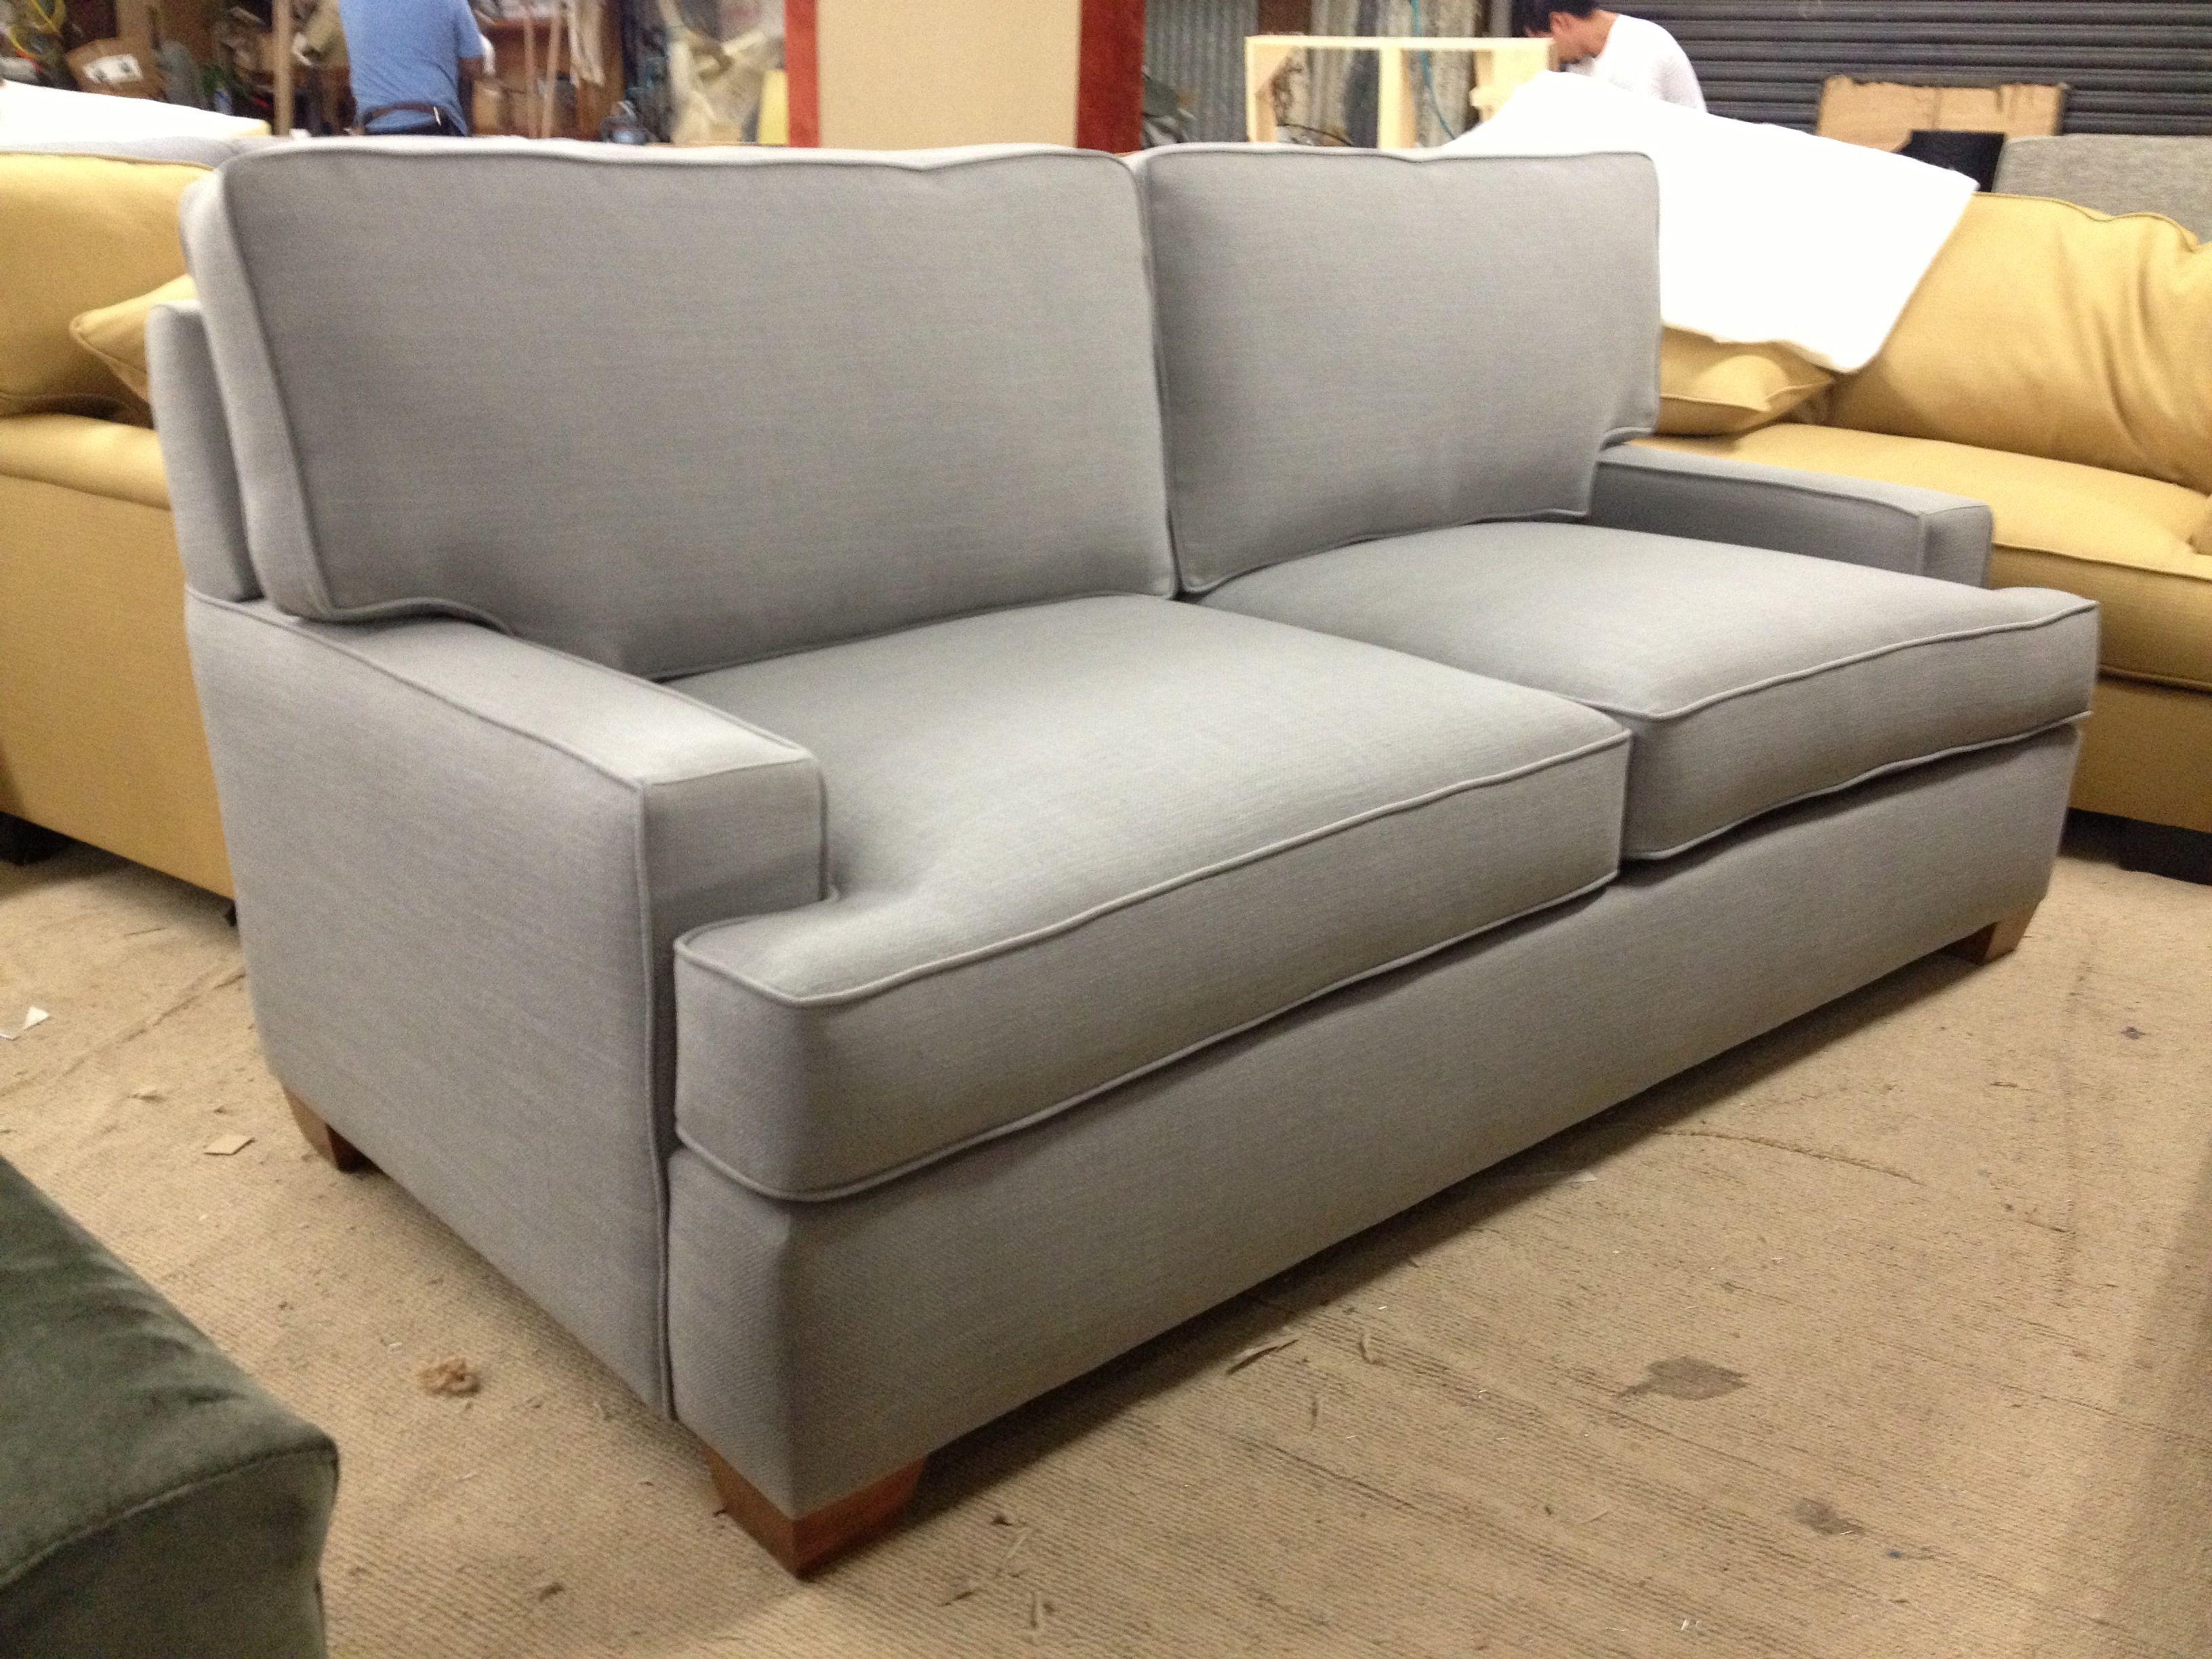 "Janna"" Sofa Every style can be customized in virtually any way"